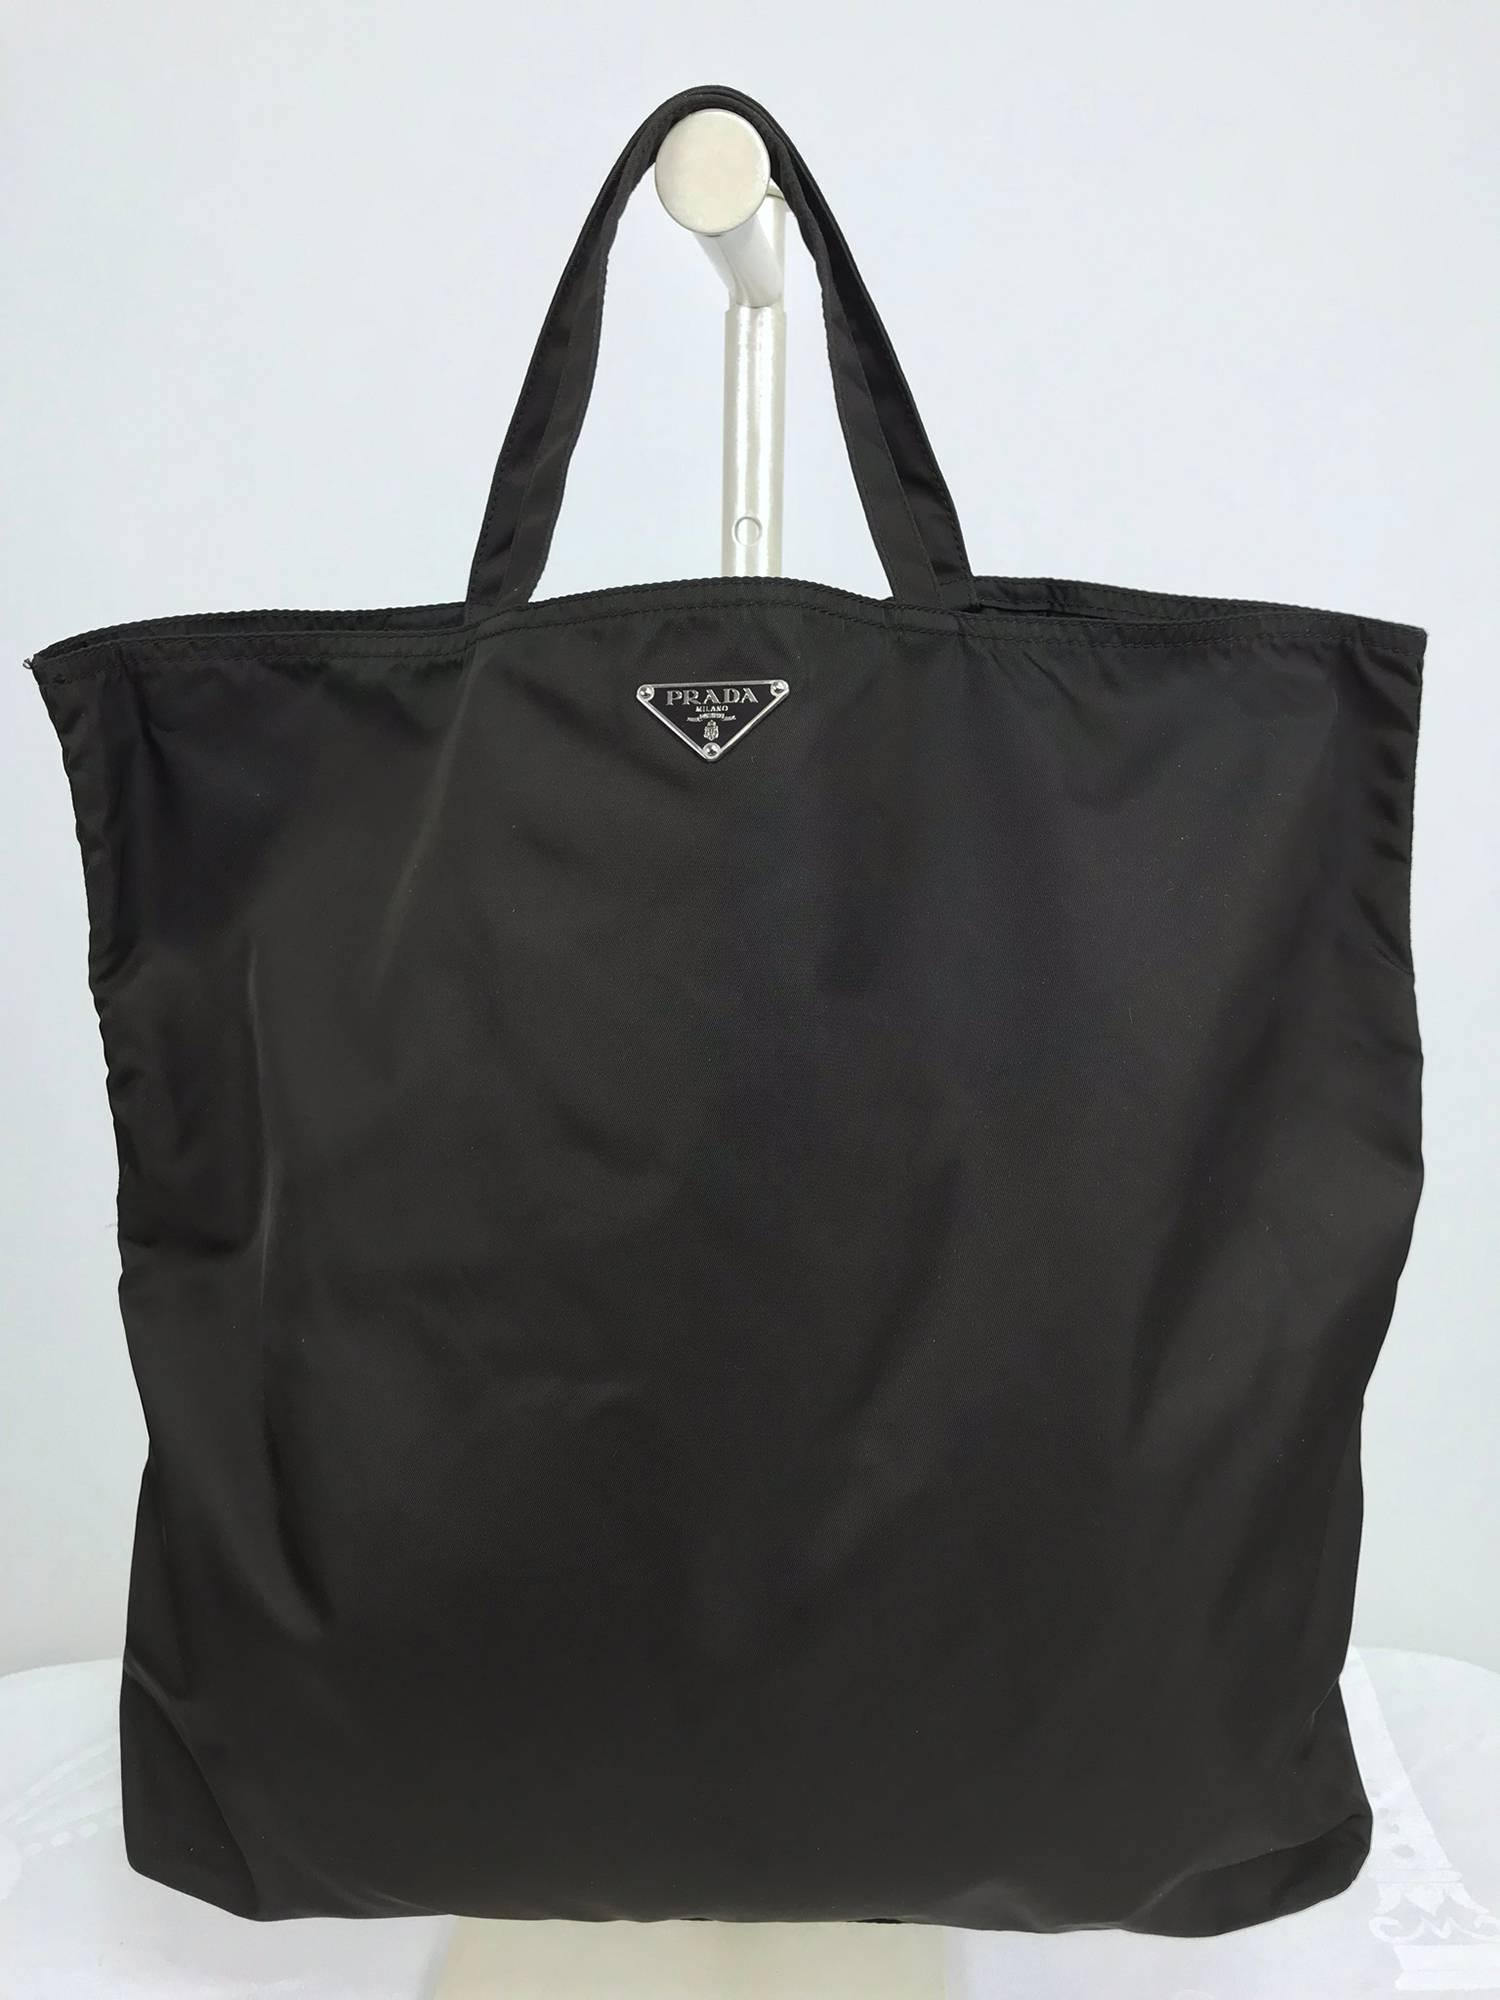 893ad6204ca1 Prada robot applique nylon tote bag at 1stdibs